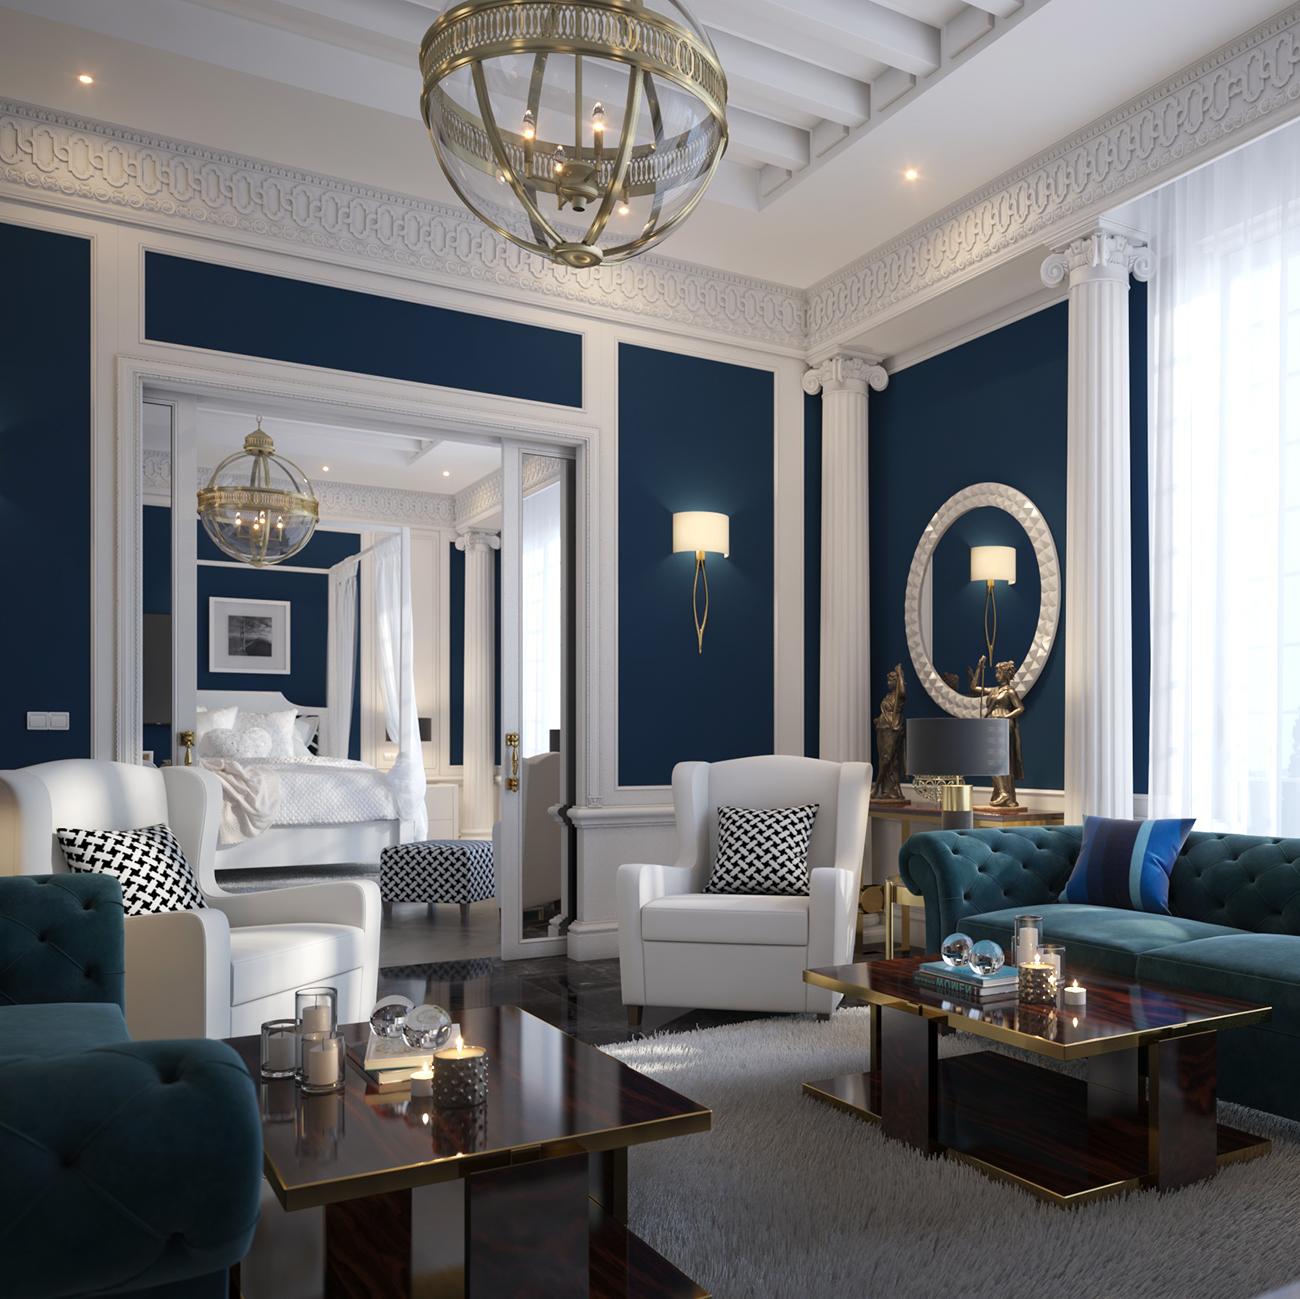 Mediterranean Style Living & Bedroom